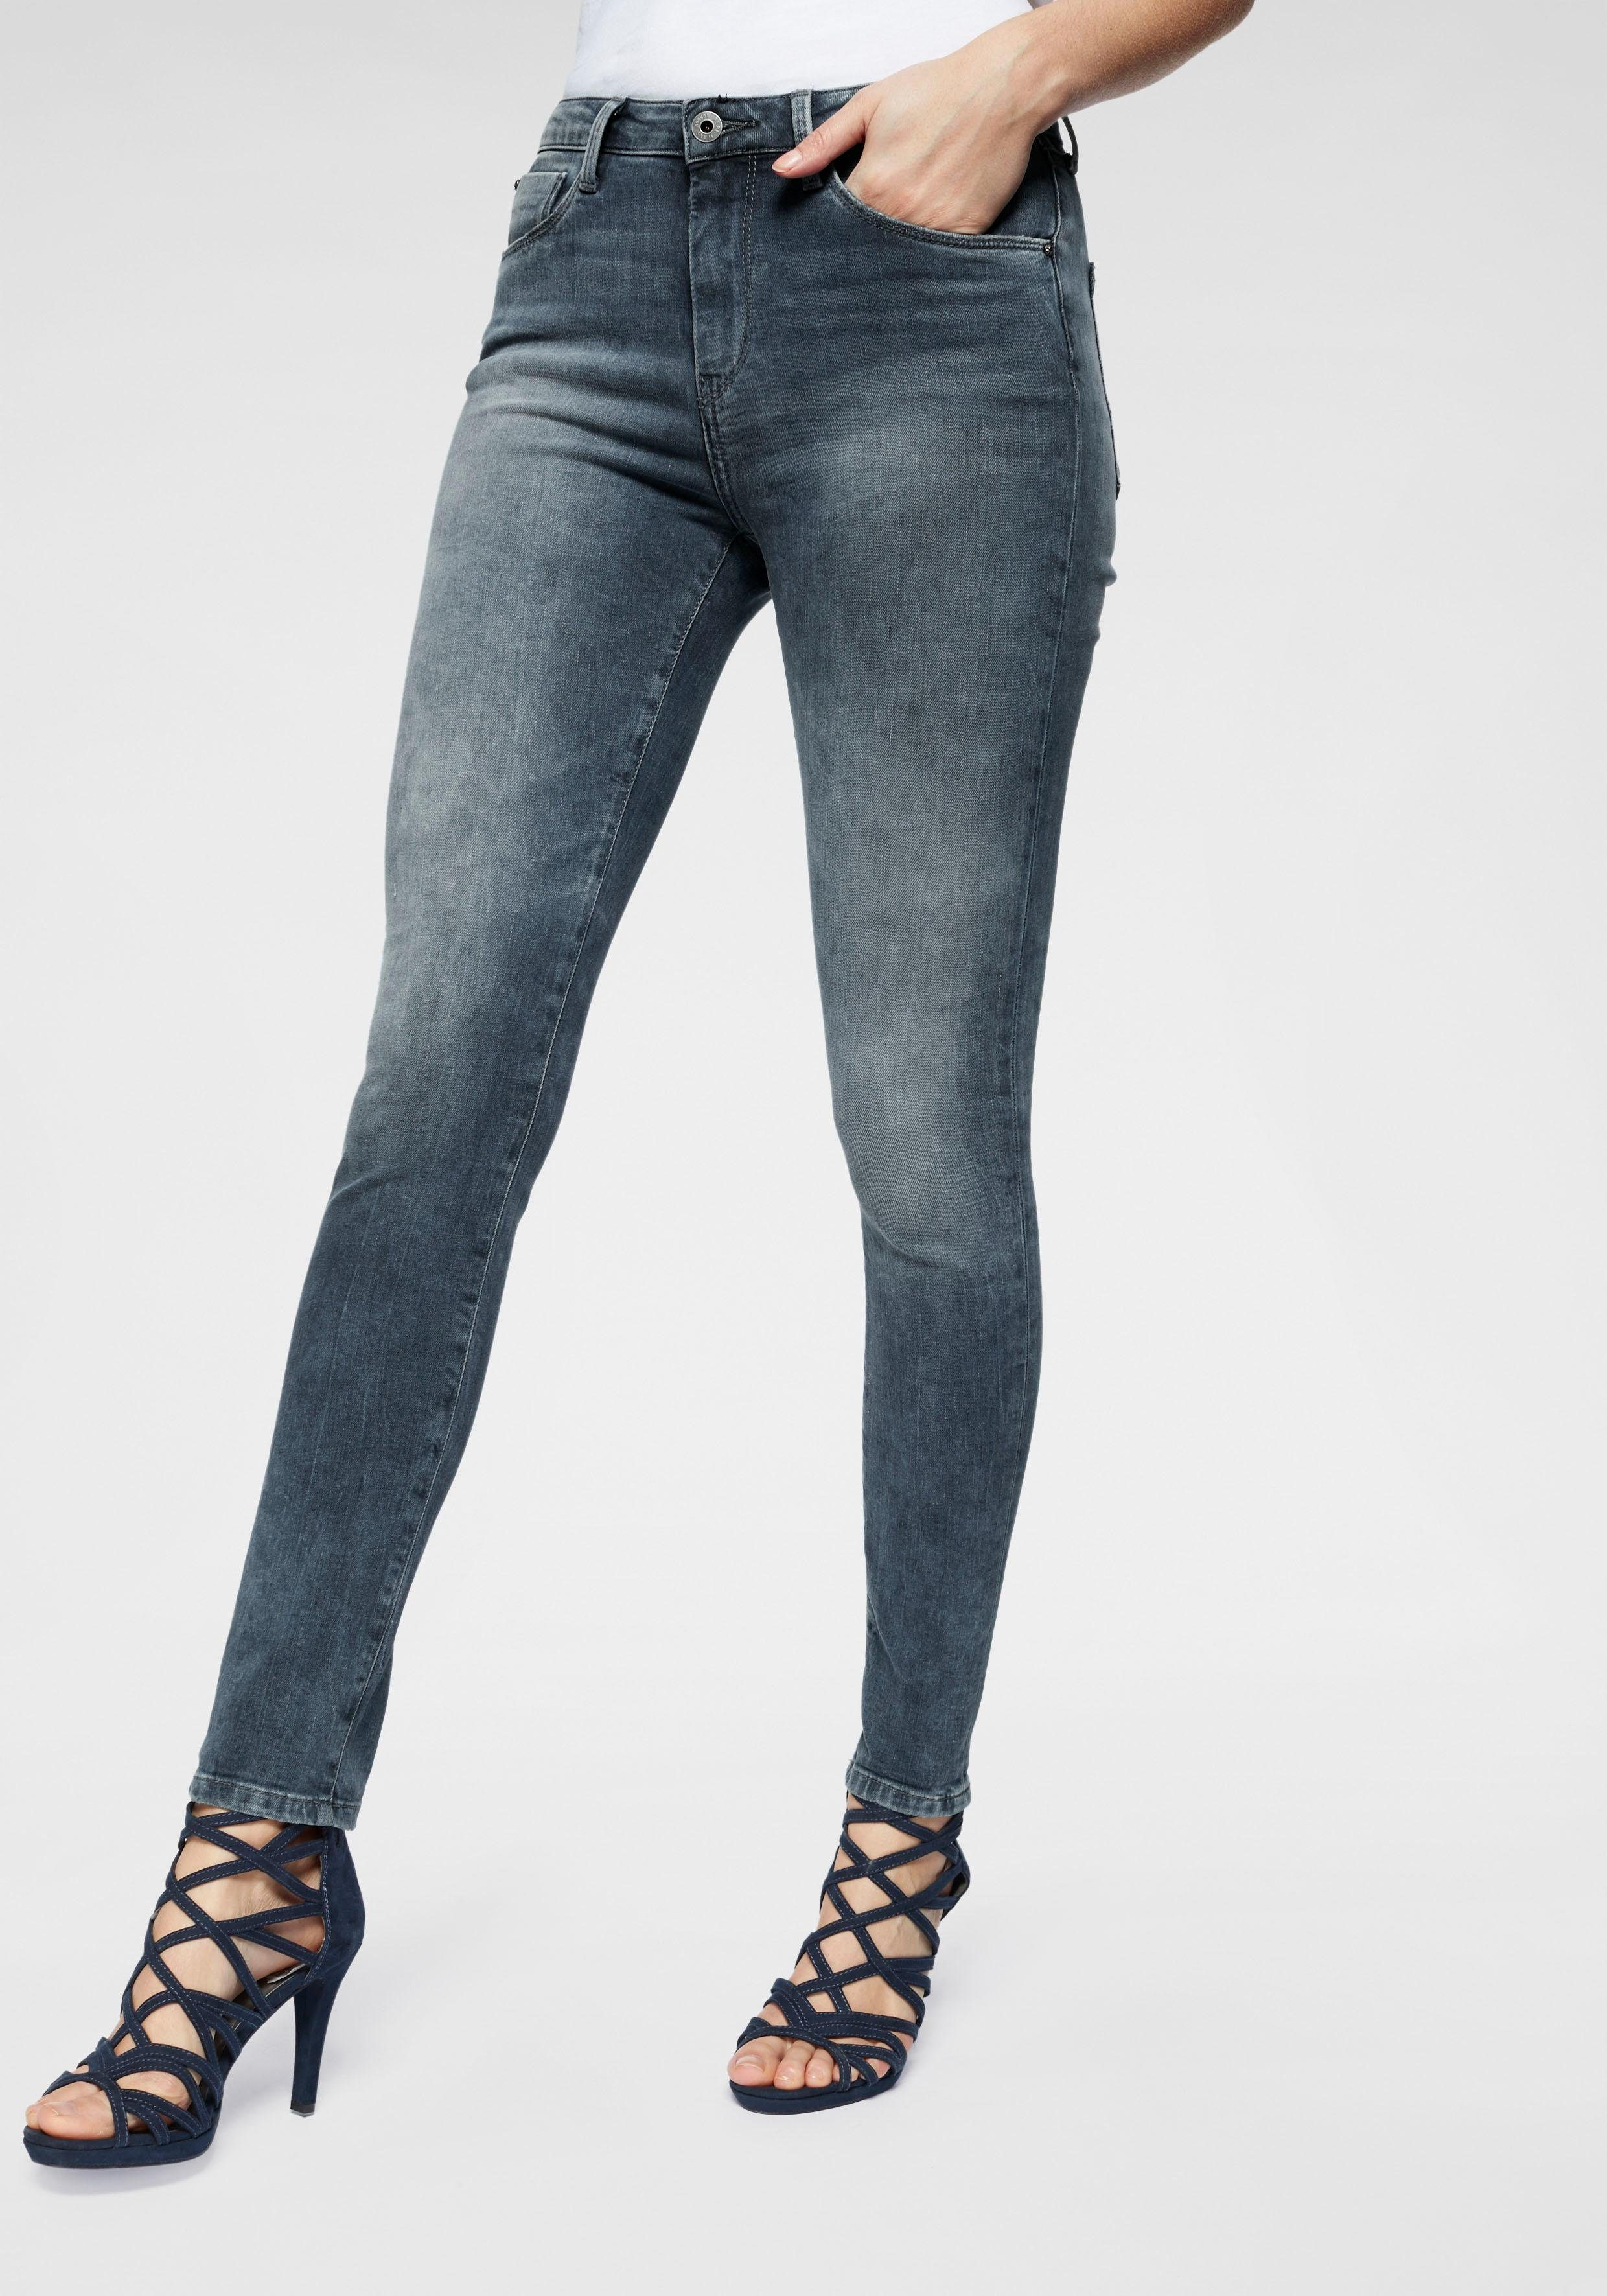 Pepe Jeans Skinny fit Jeans »REGENT« mit High Waist online kaufen | OTTO